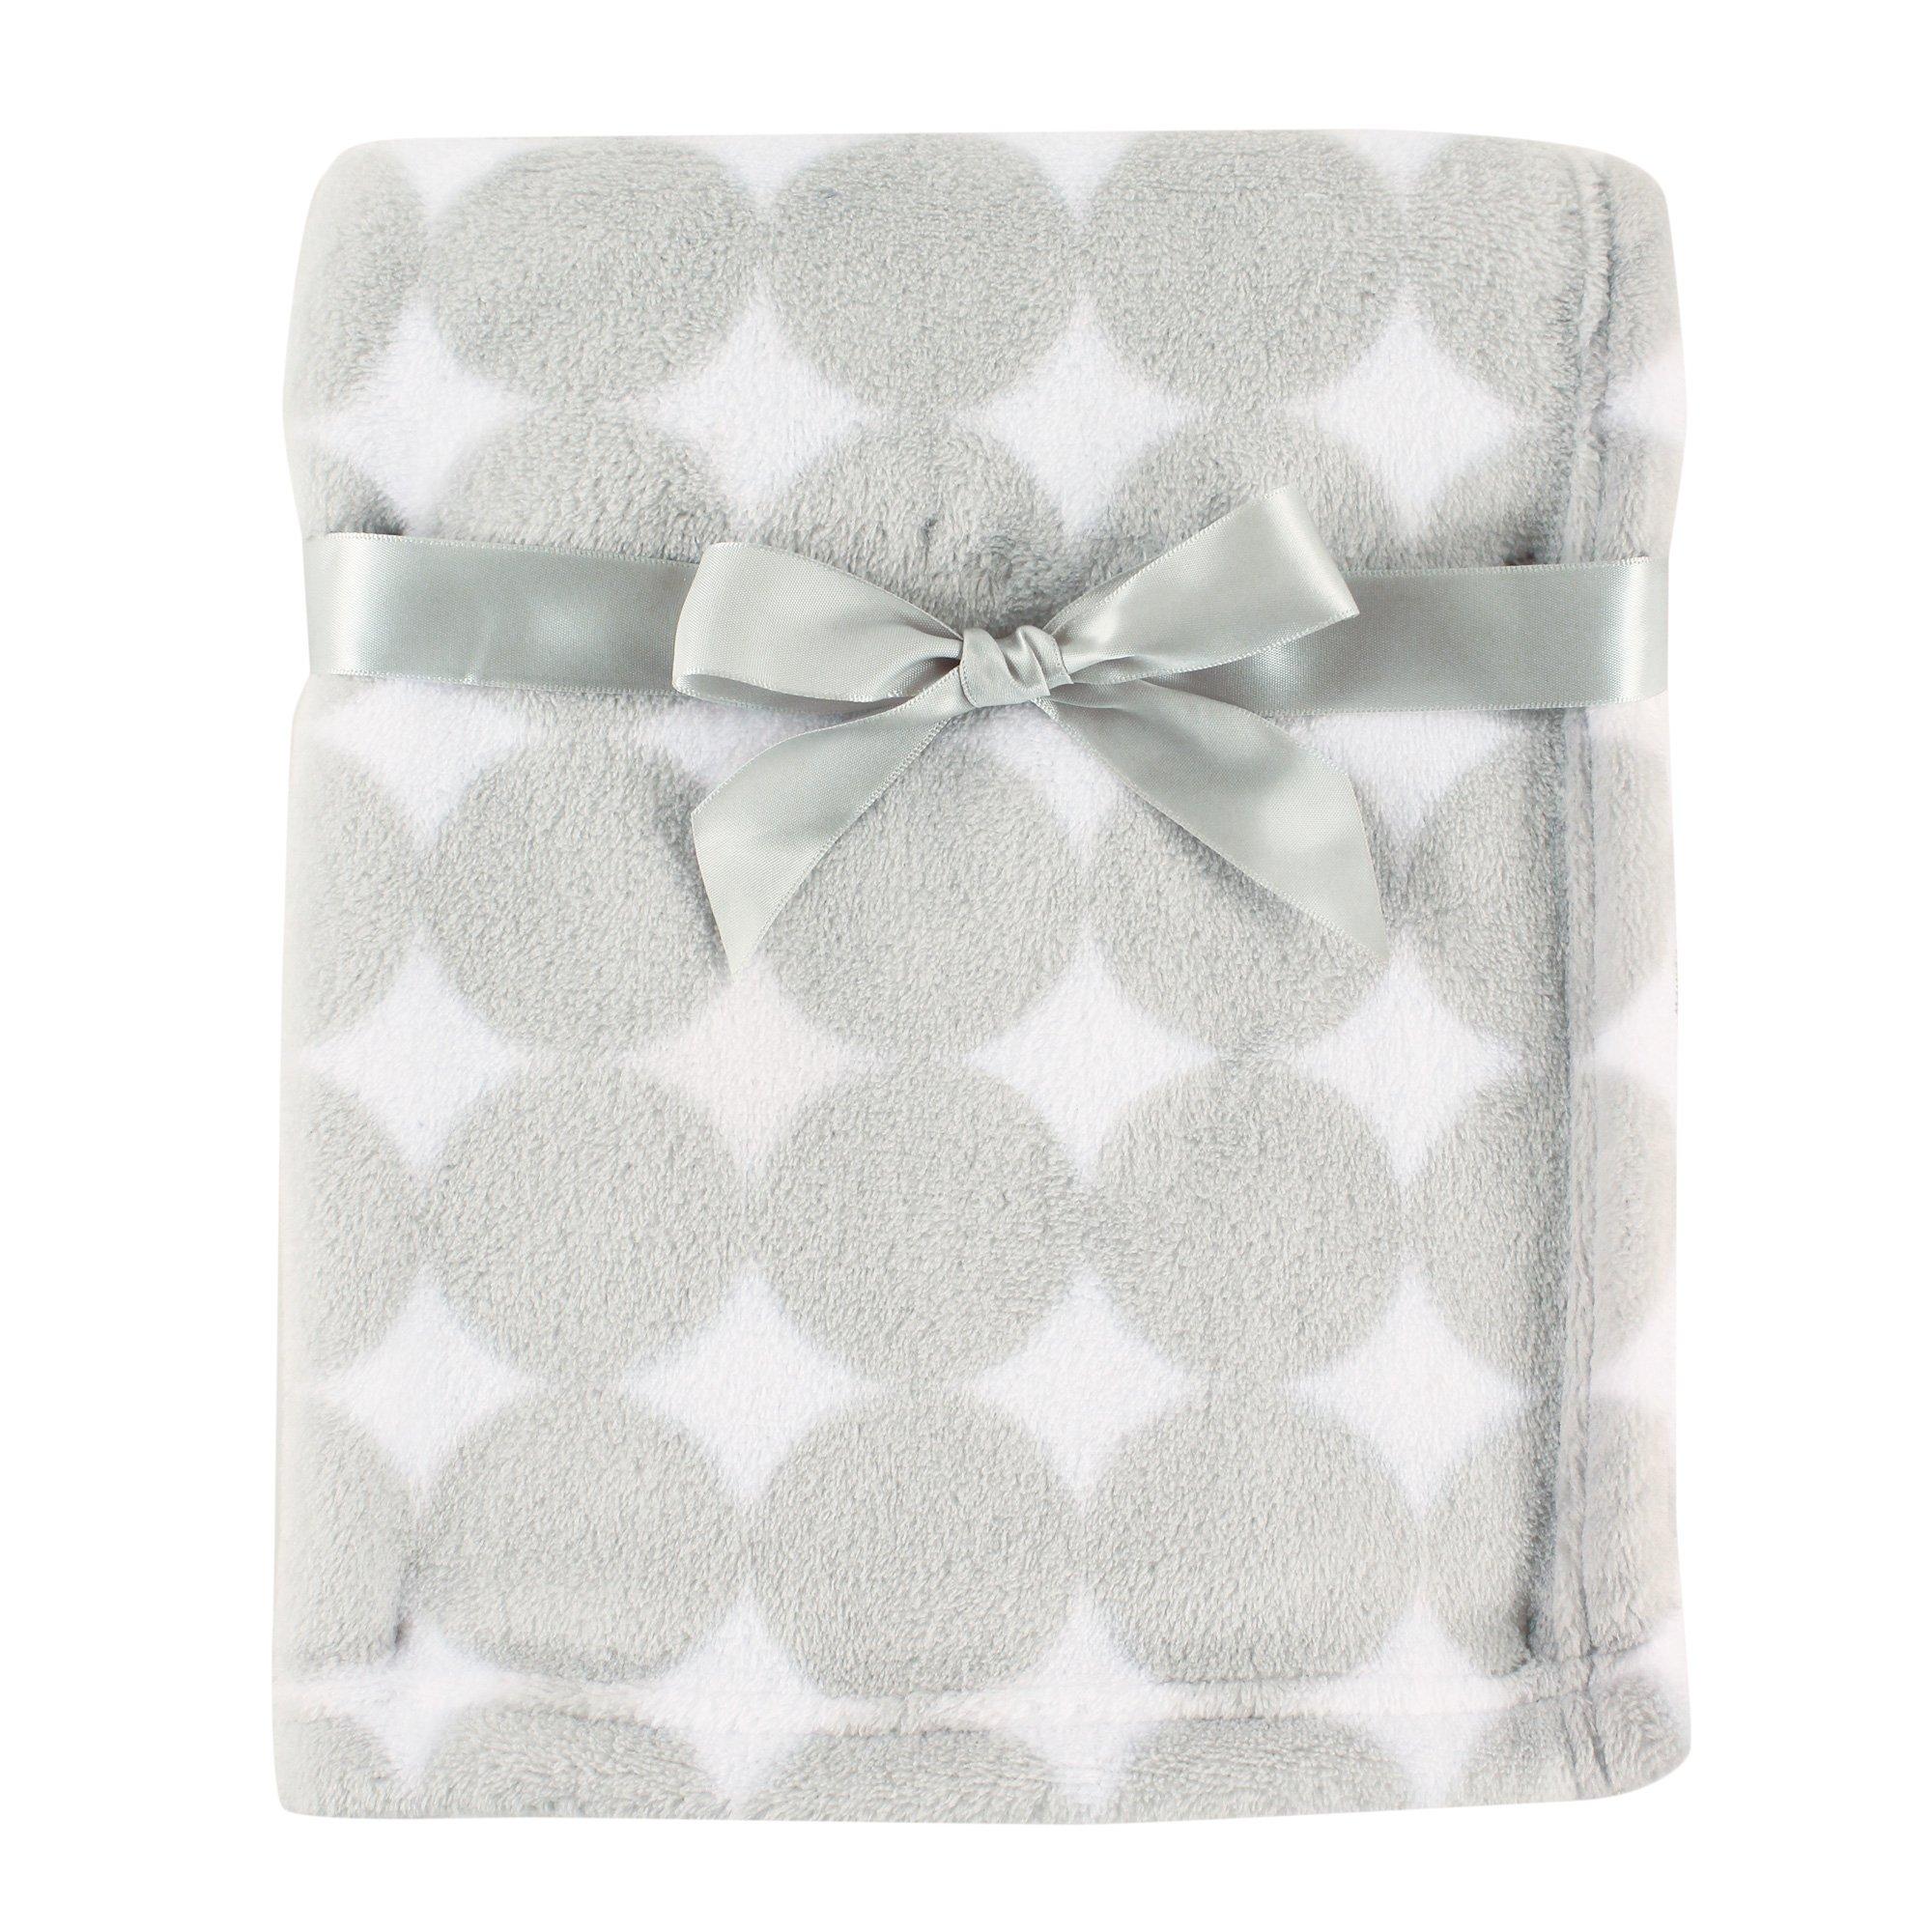 Luvable Friends Print Coral Fleece Blanket, Gray Circles